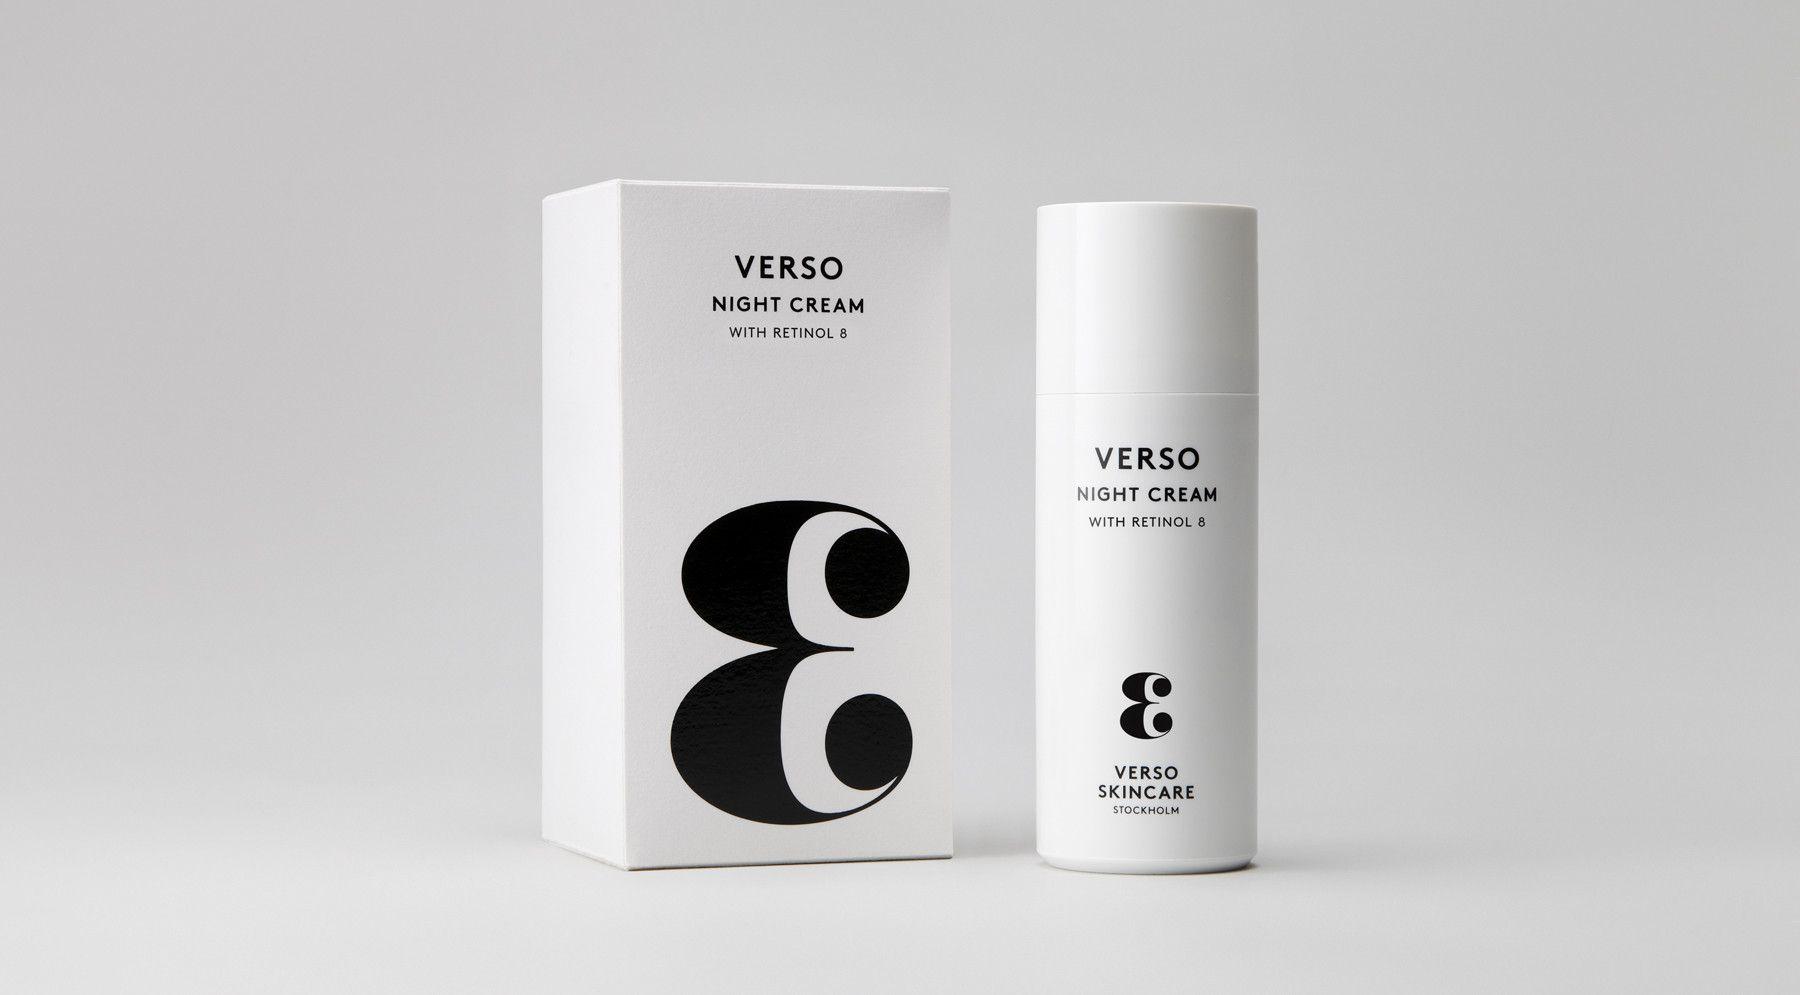 Verso Night Cream with Retinol